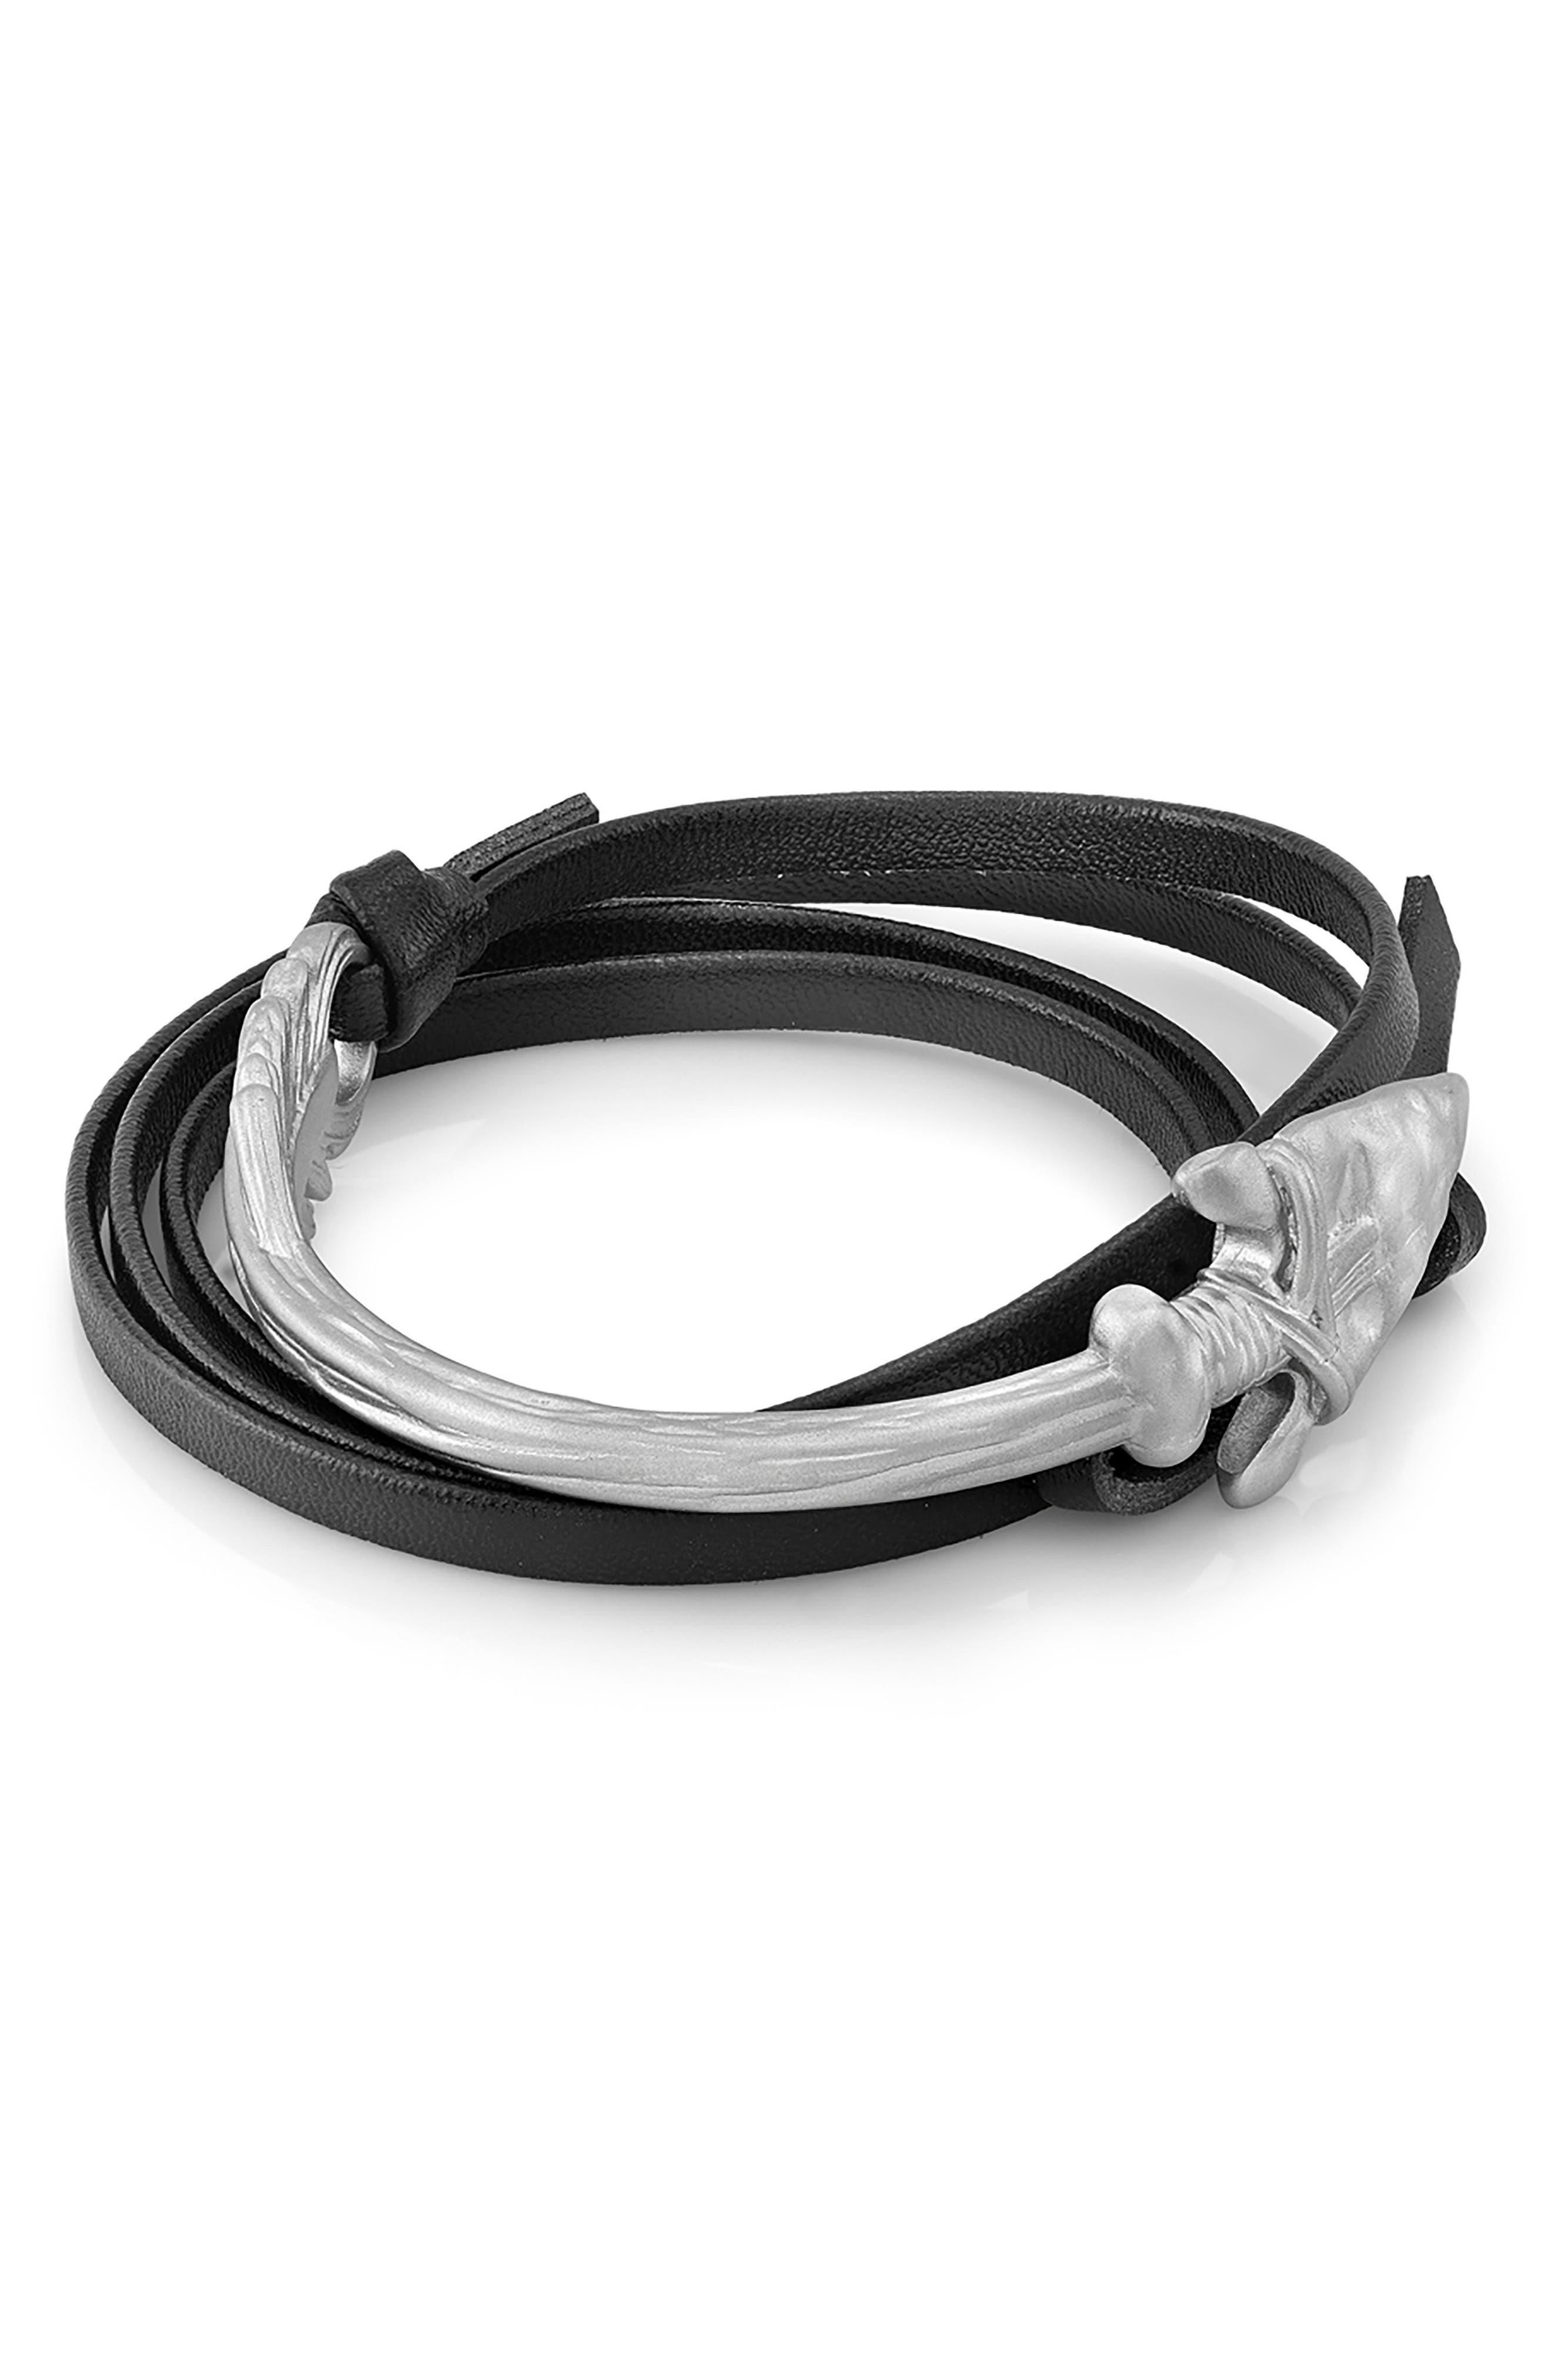 Main Image - Room101 Arrow Leather Wrap Bracelet